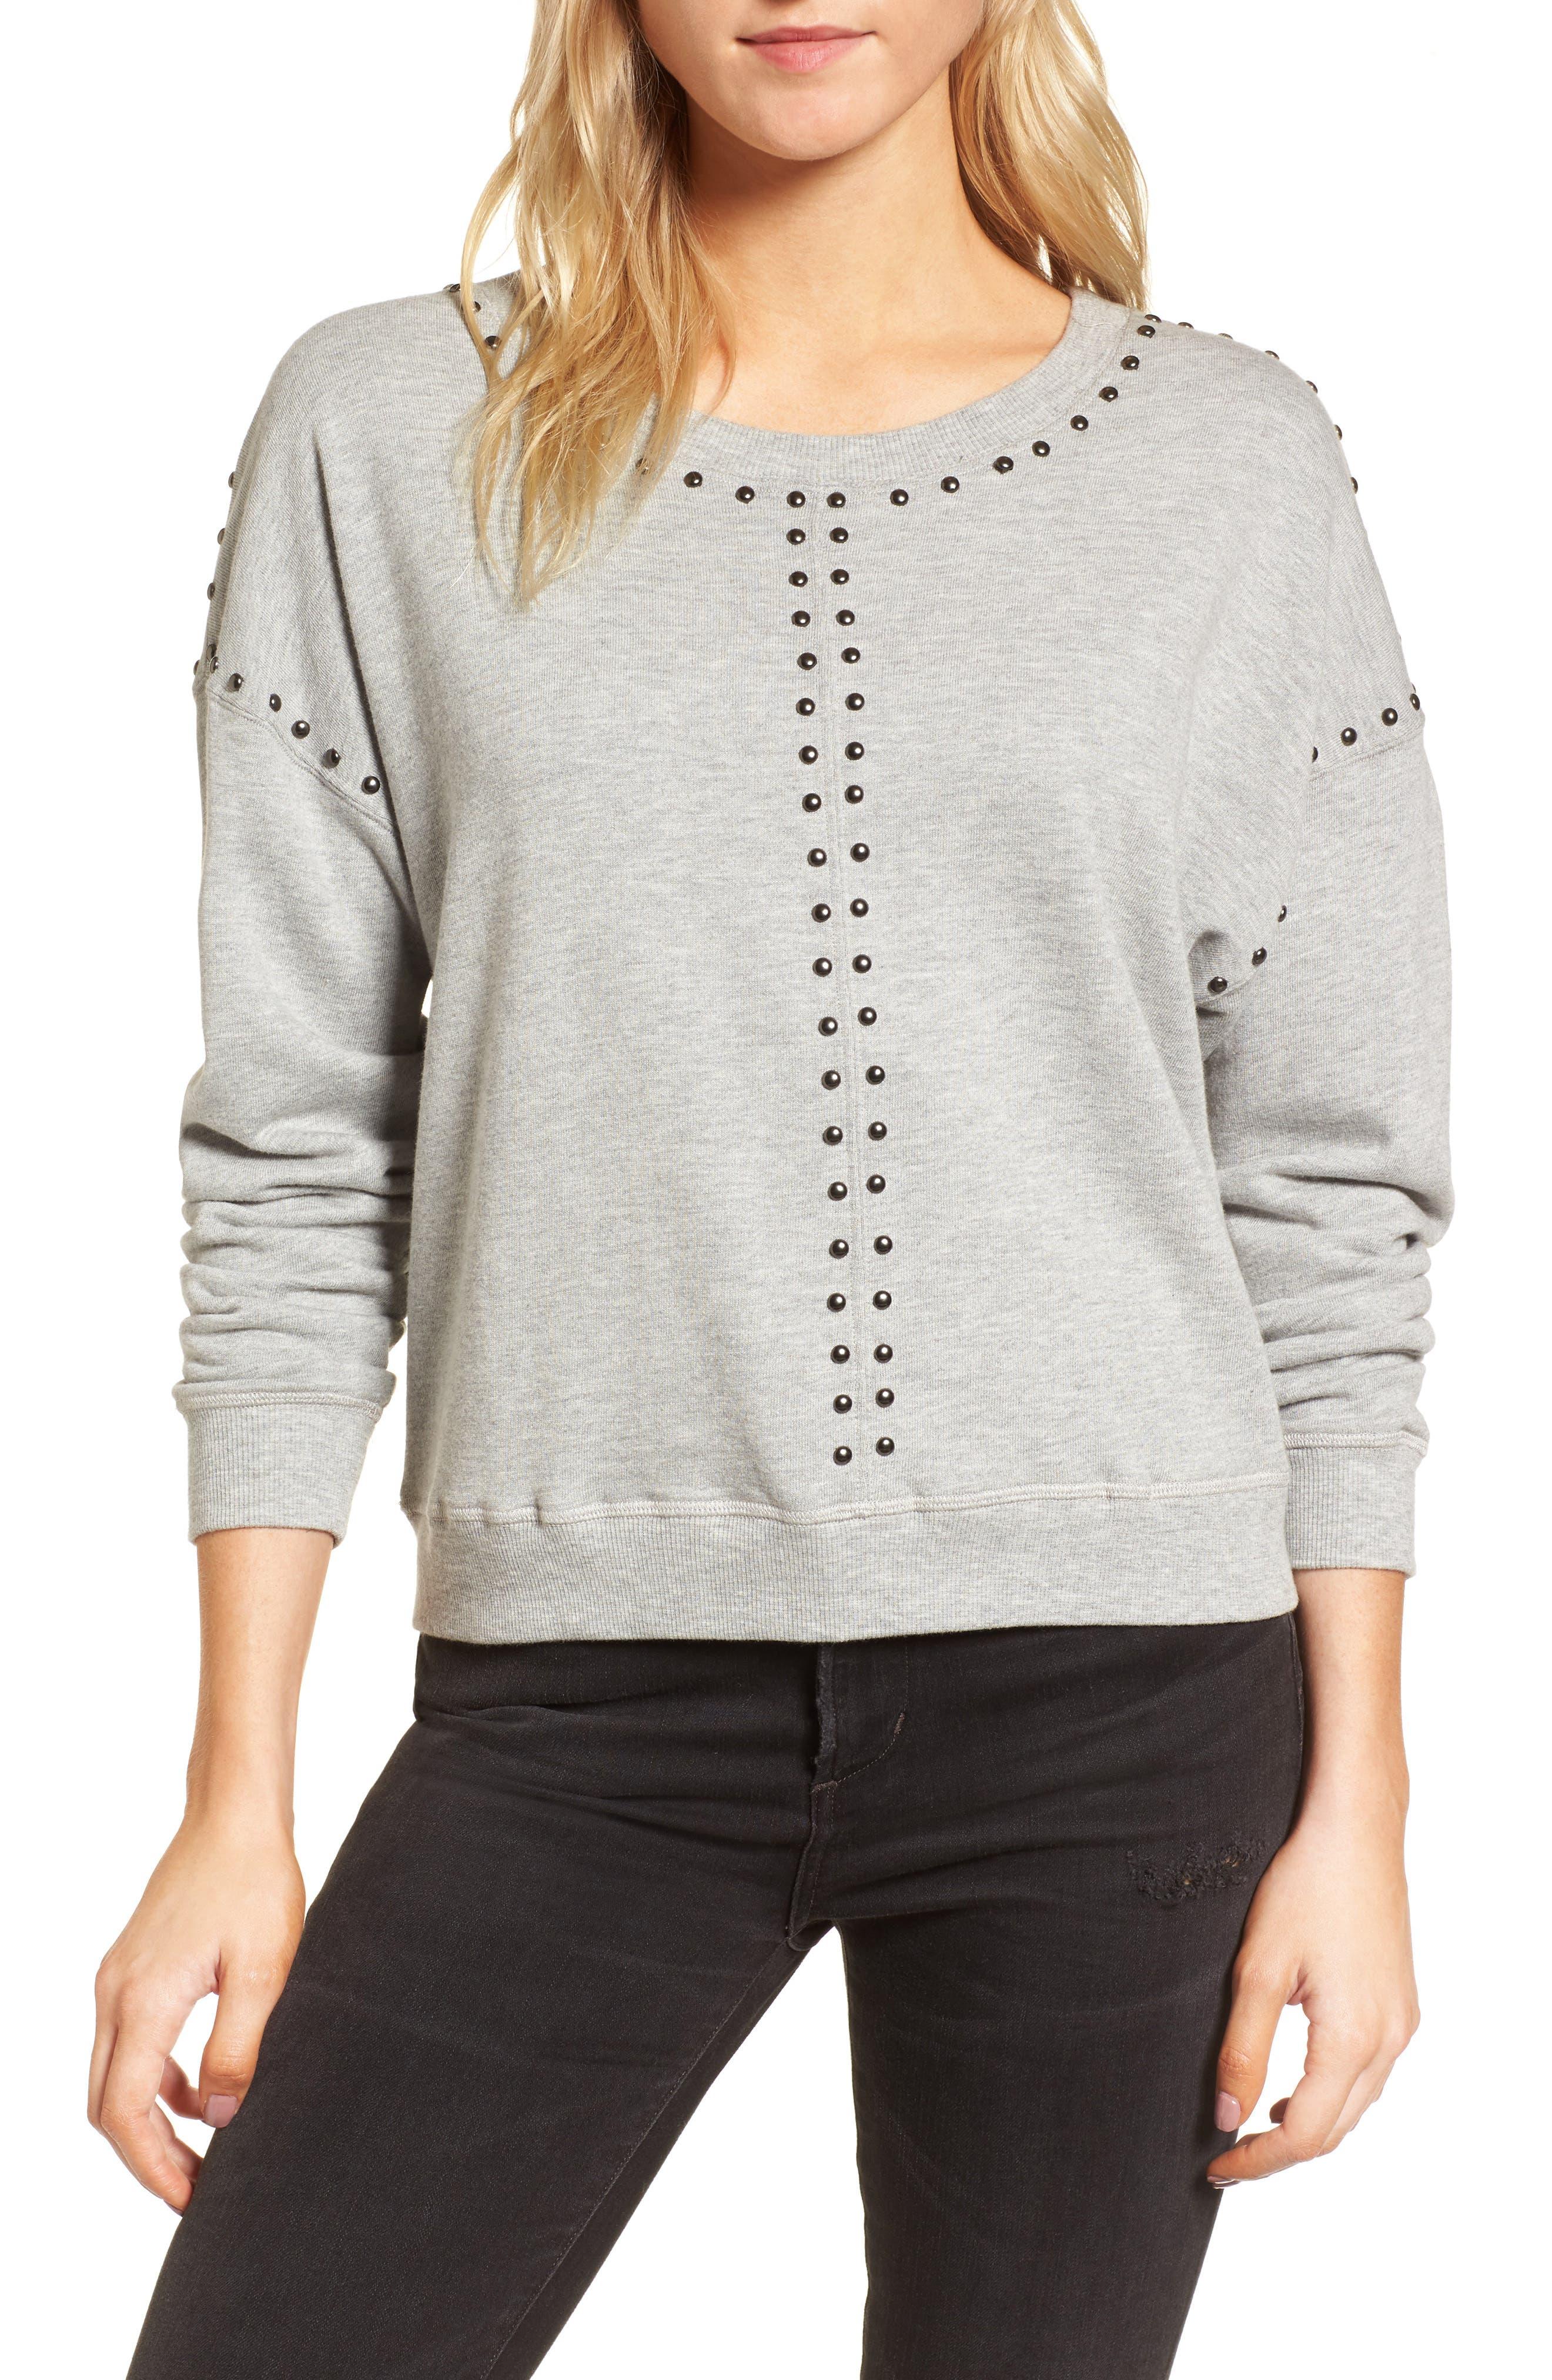 Wilson Studded Sweatshirt,                             Main thumbnail 1, color,                             052